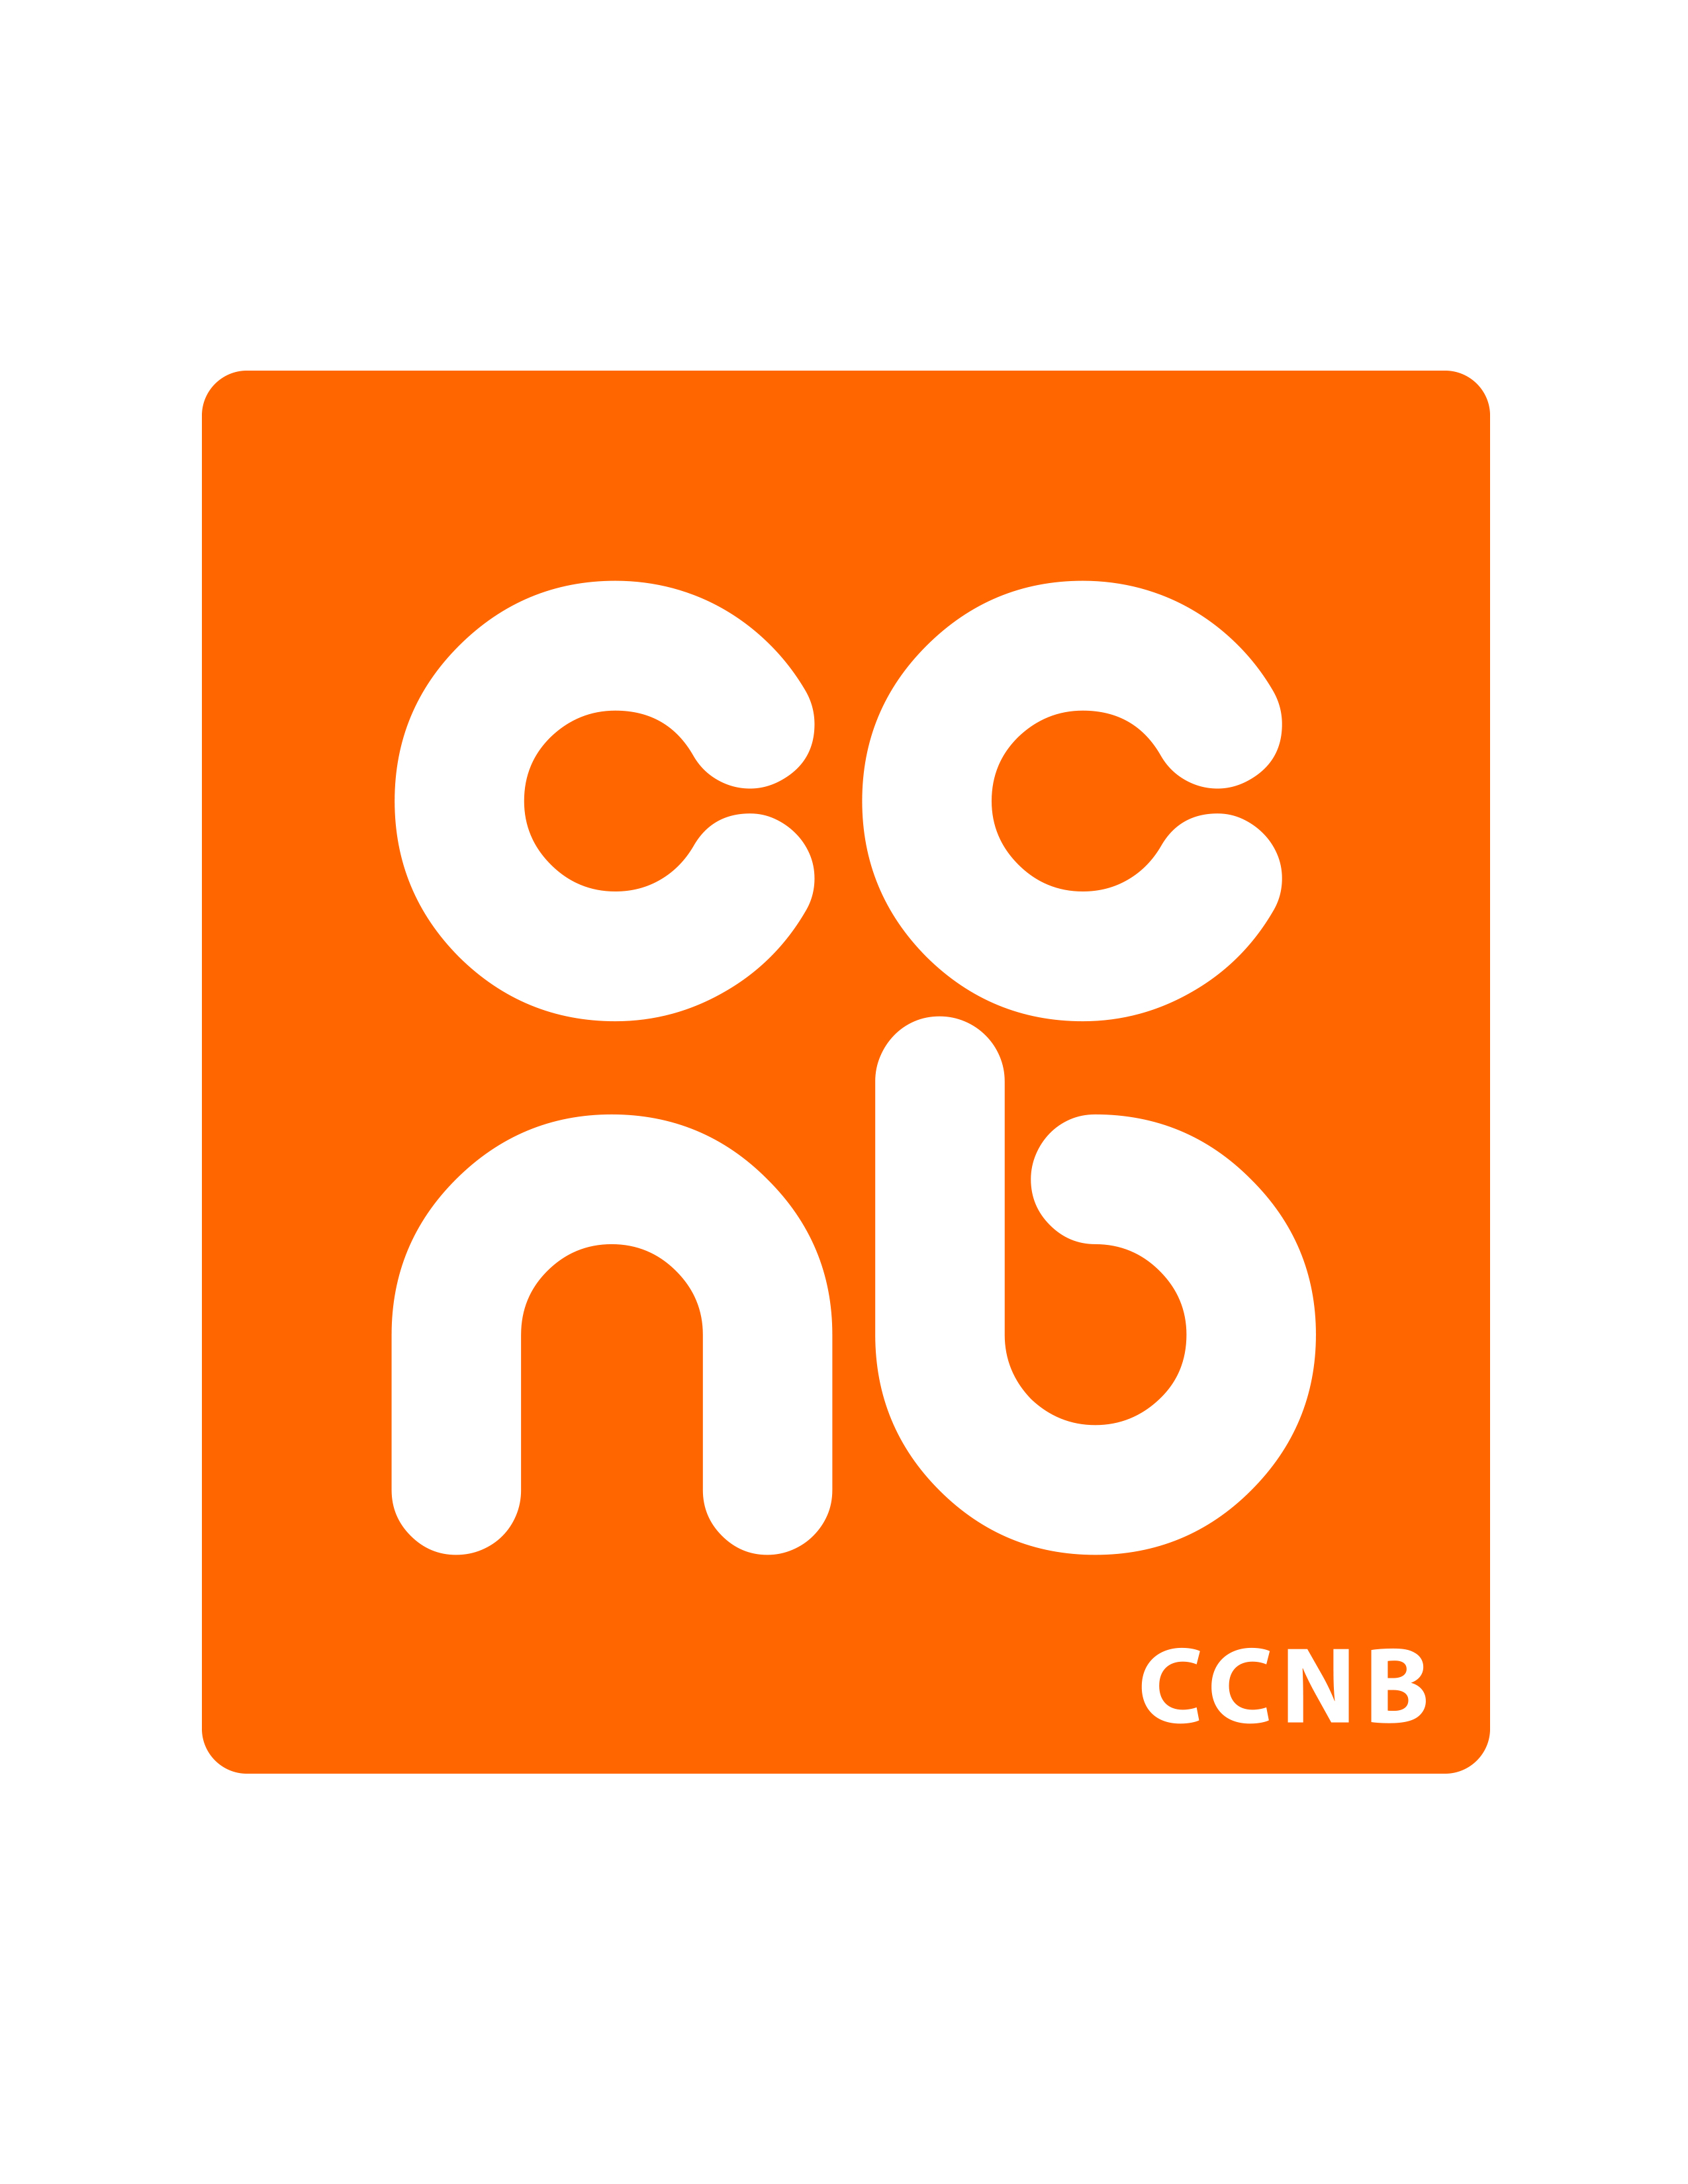 CCNB Orange Logo Wallpaper